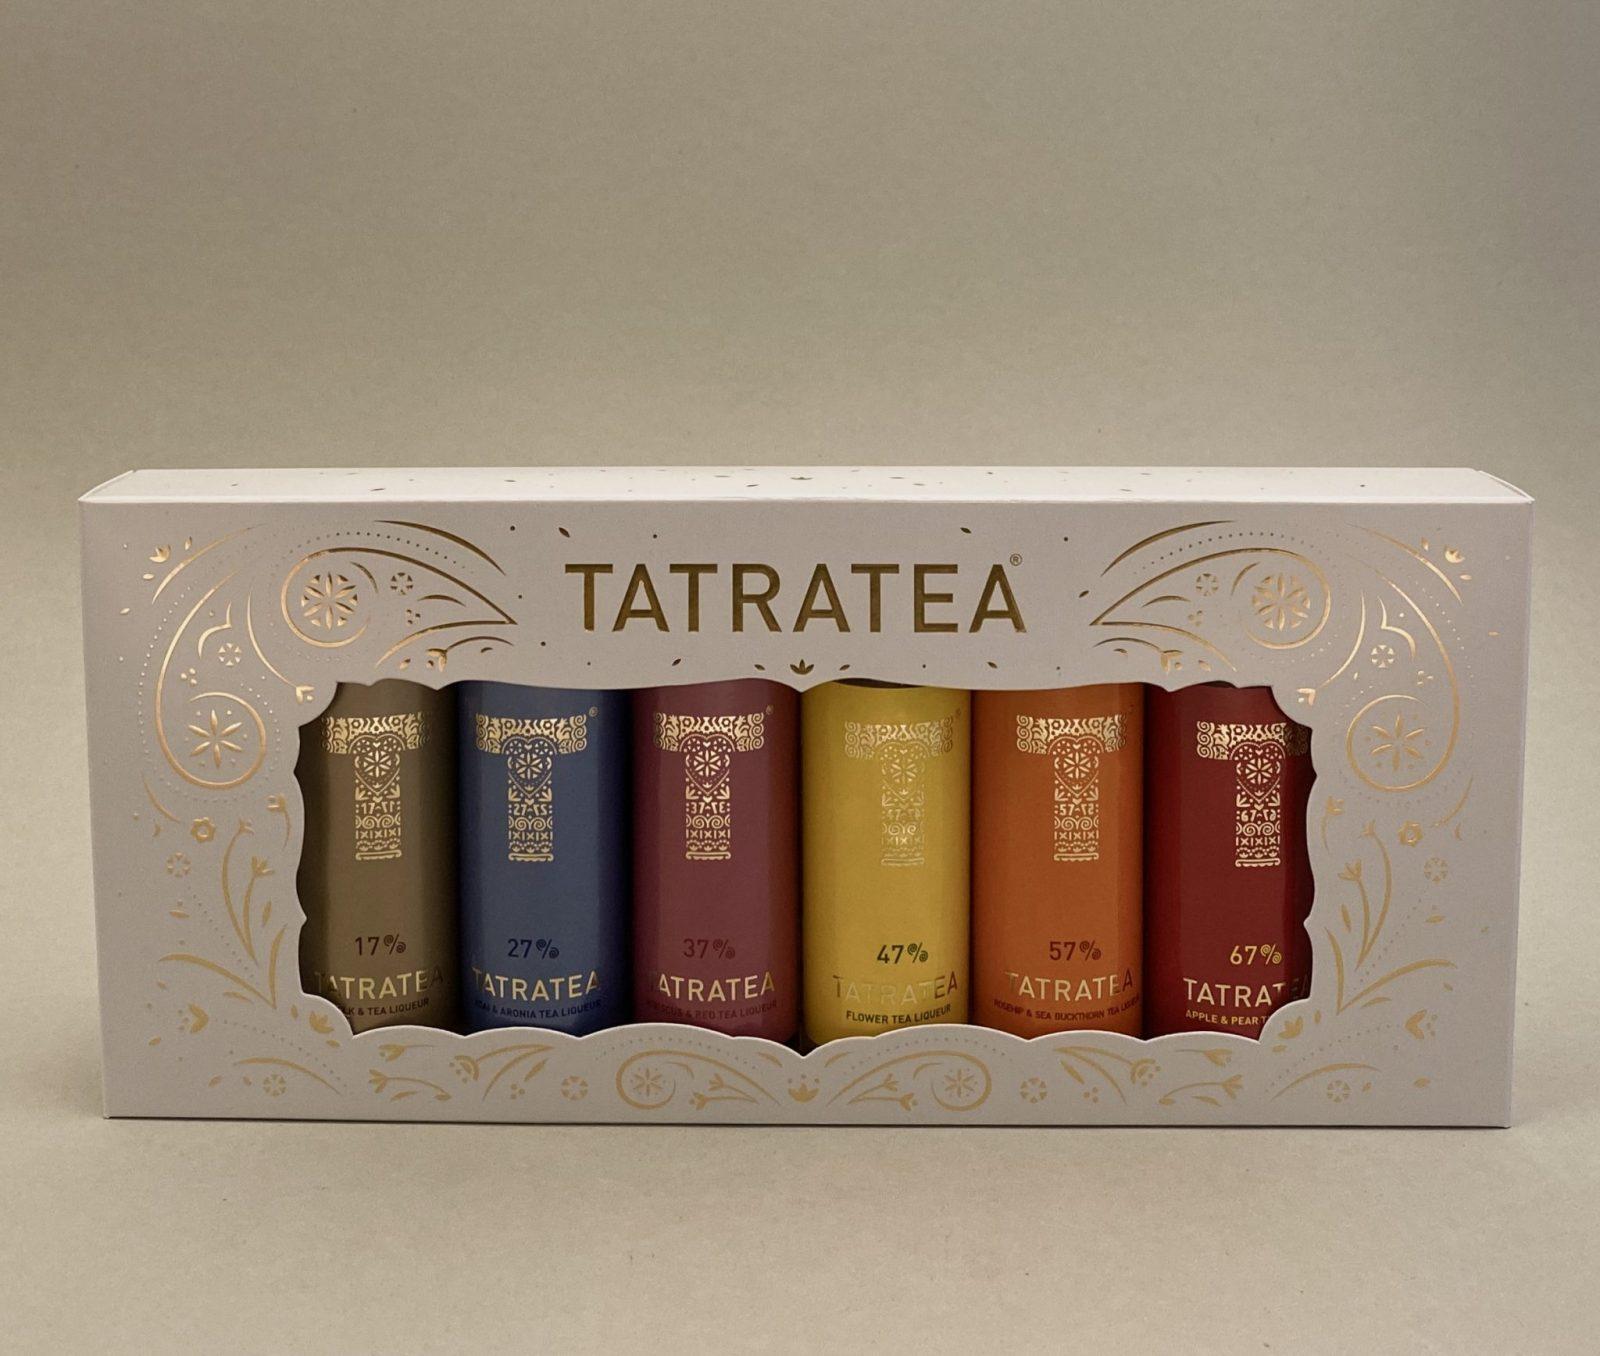 TATRATEA Mini Set 22 72%, Bottleshop Sunny wines slnecnice mesto, petrzalka, Tatratea, rozvoz alkoholu, eshop